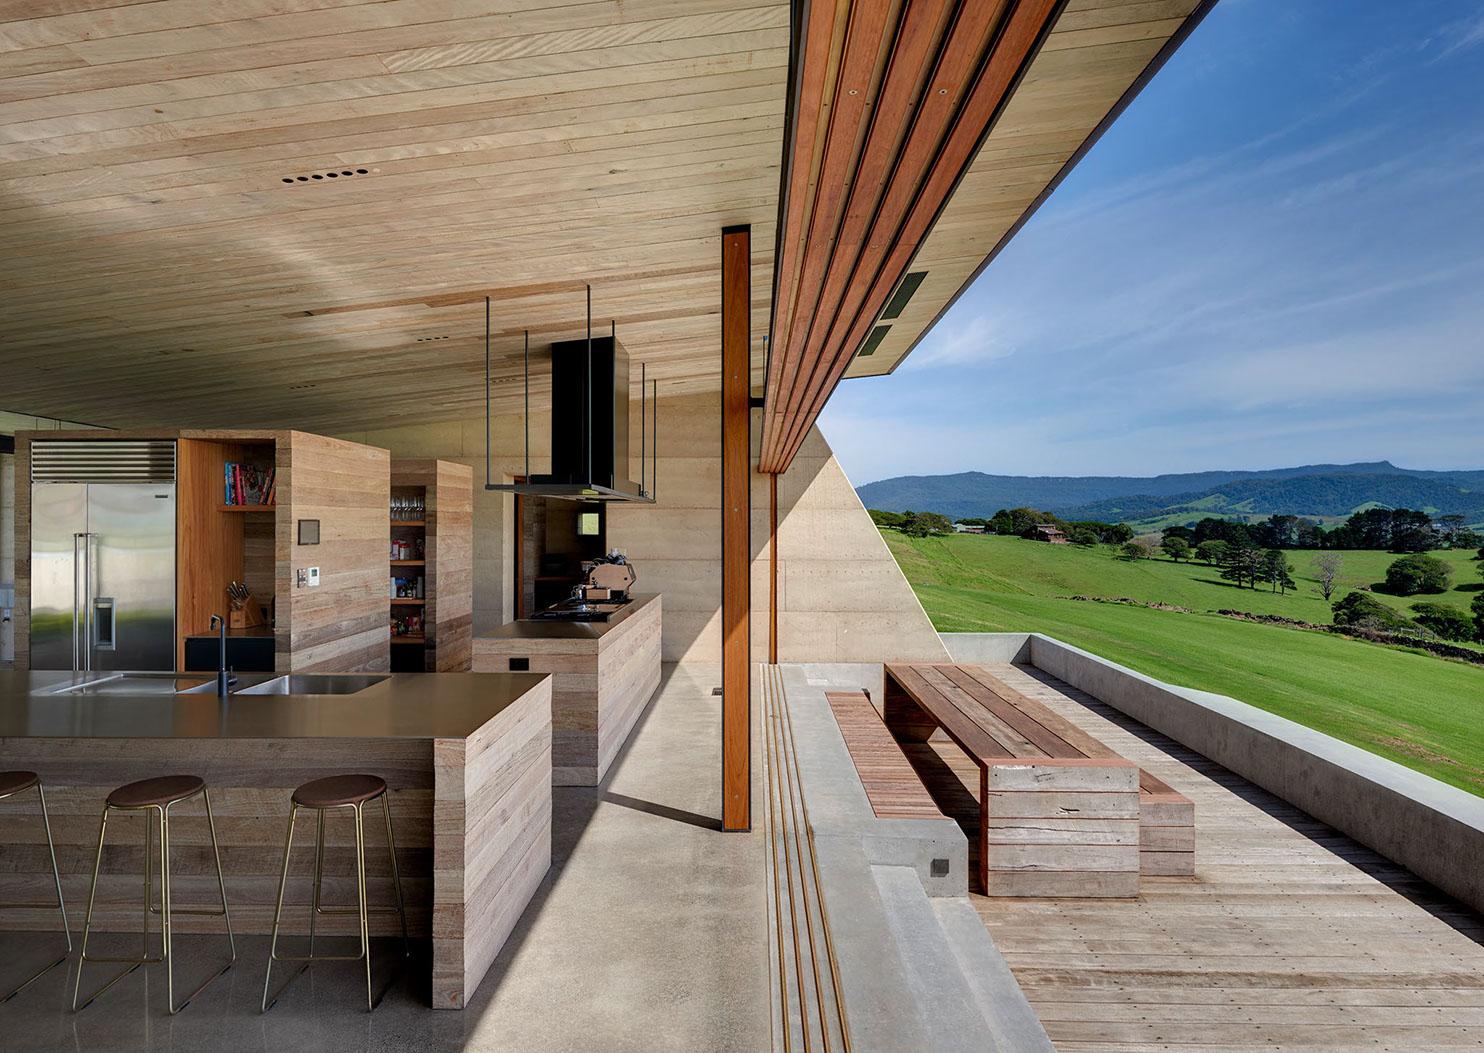 Concrete Kitchen by Fergus Scott Architects